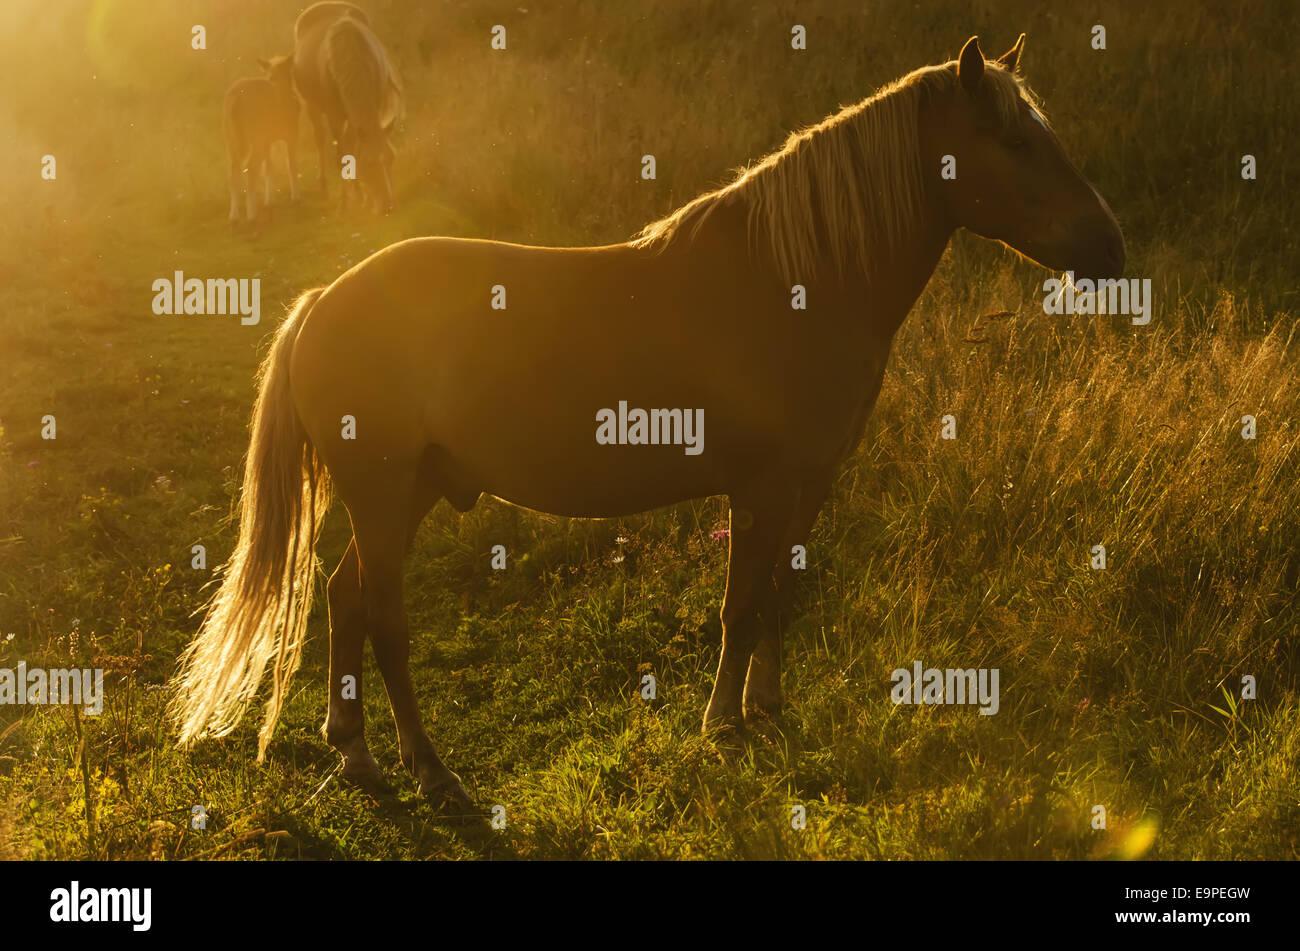 Magic horse - Stock Image